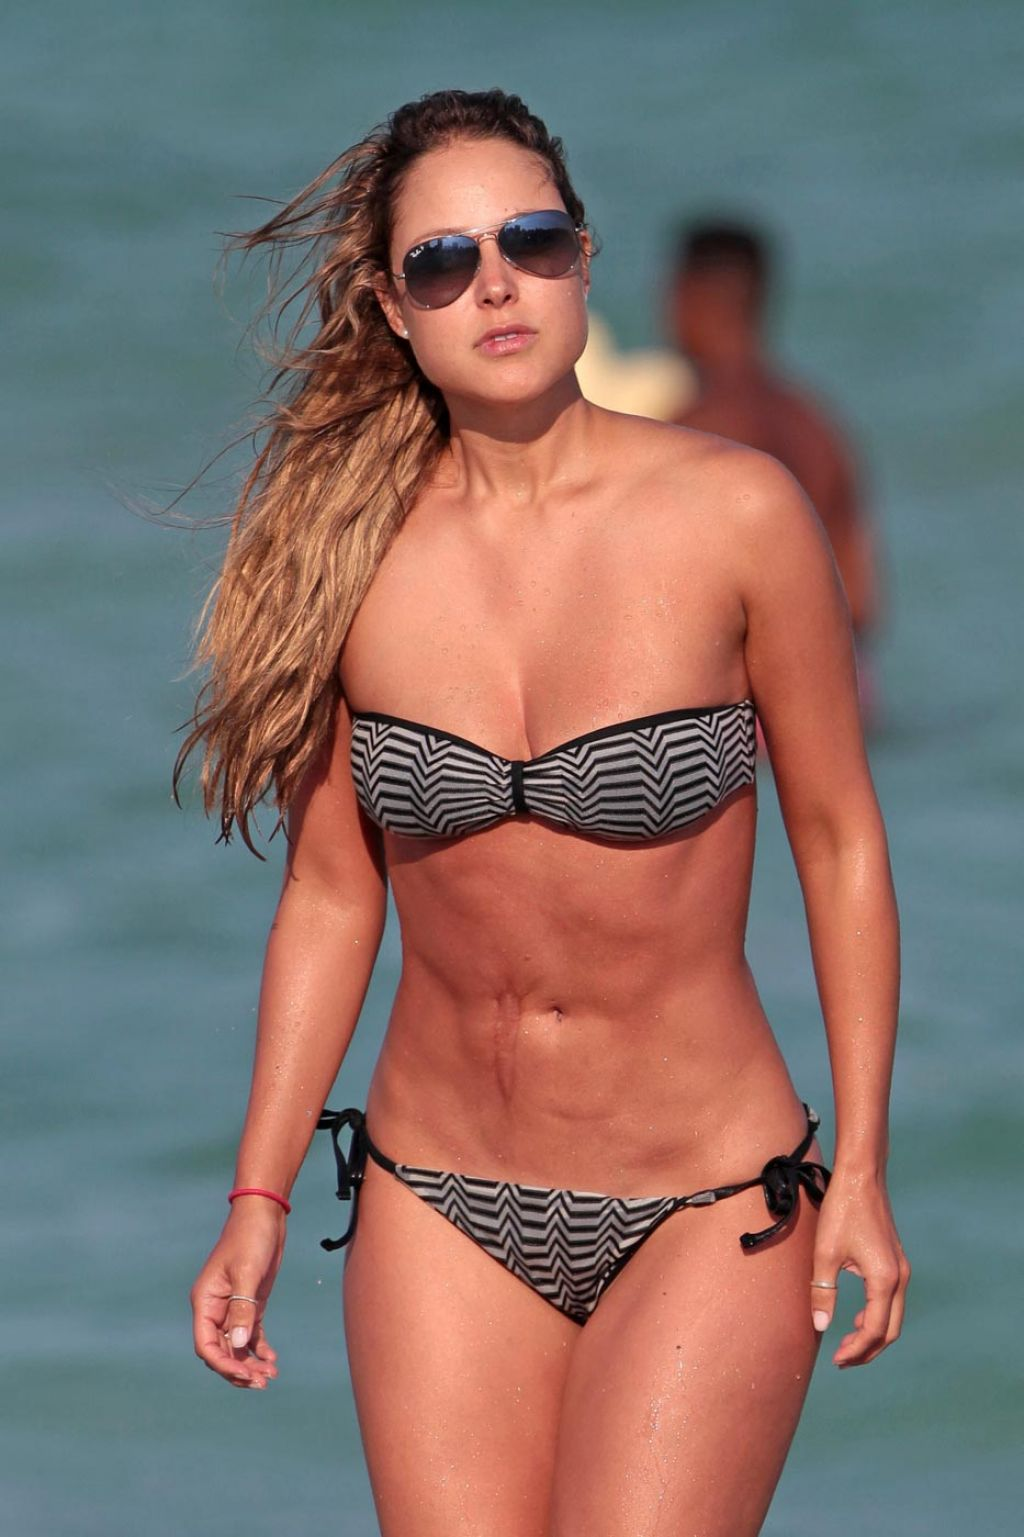 Marcas de bikini 06 - 2 part 2